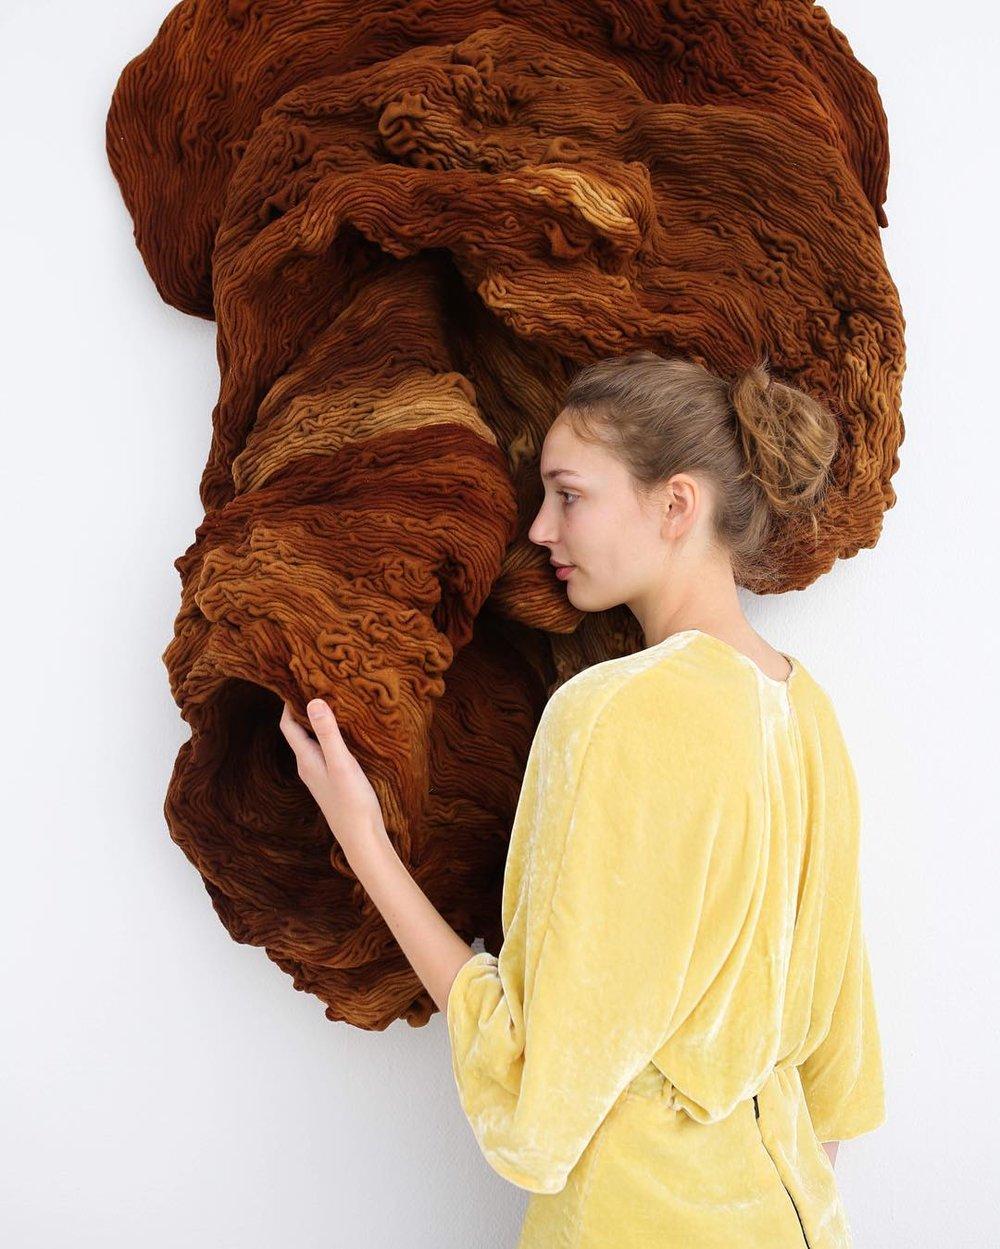 Handdyed sculpture and blouse-hanne-friis.jpg